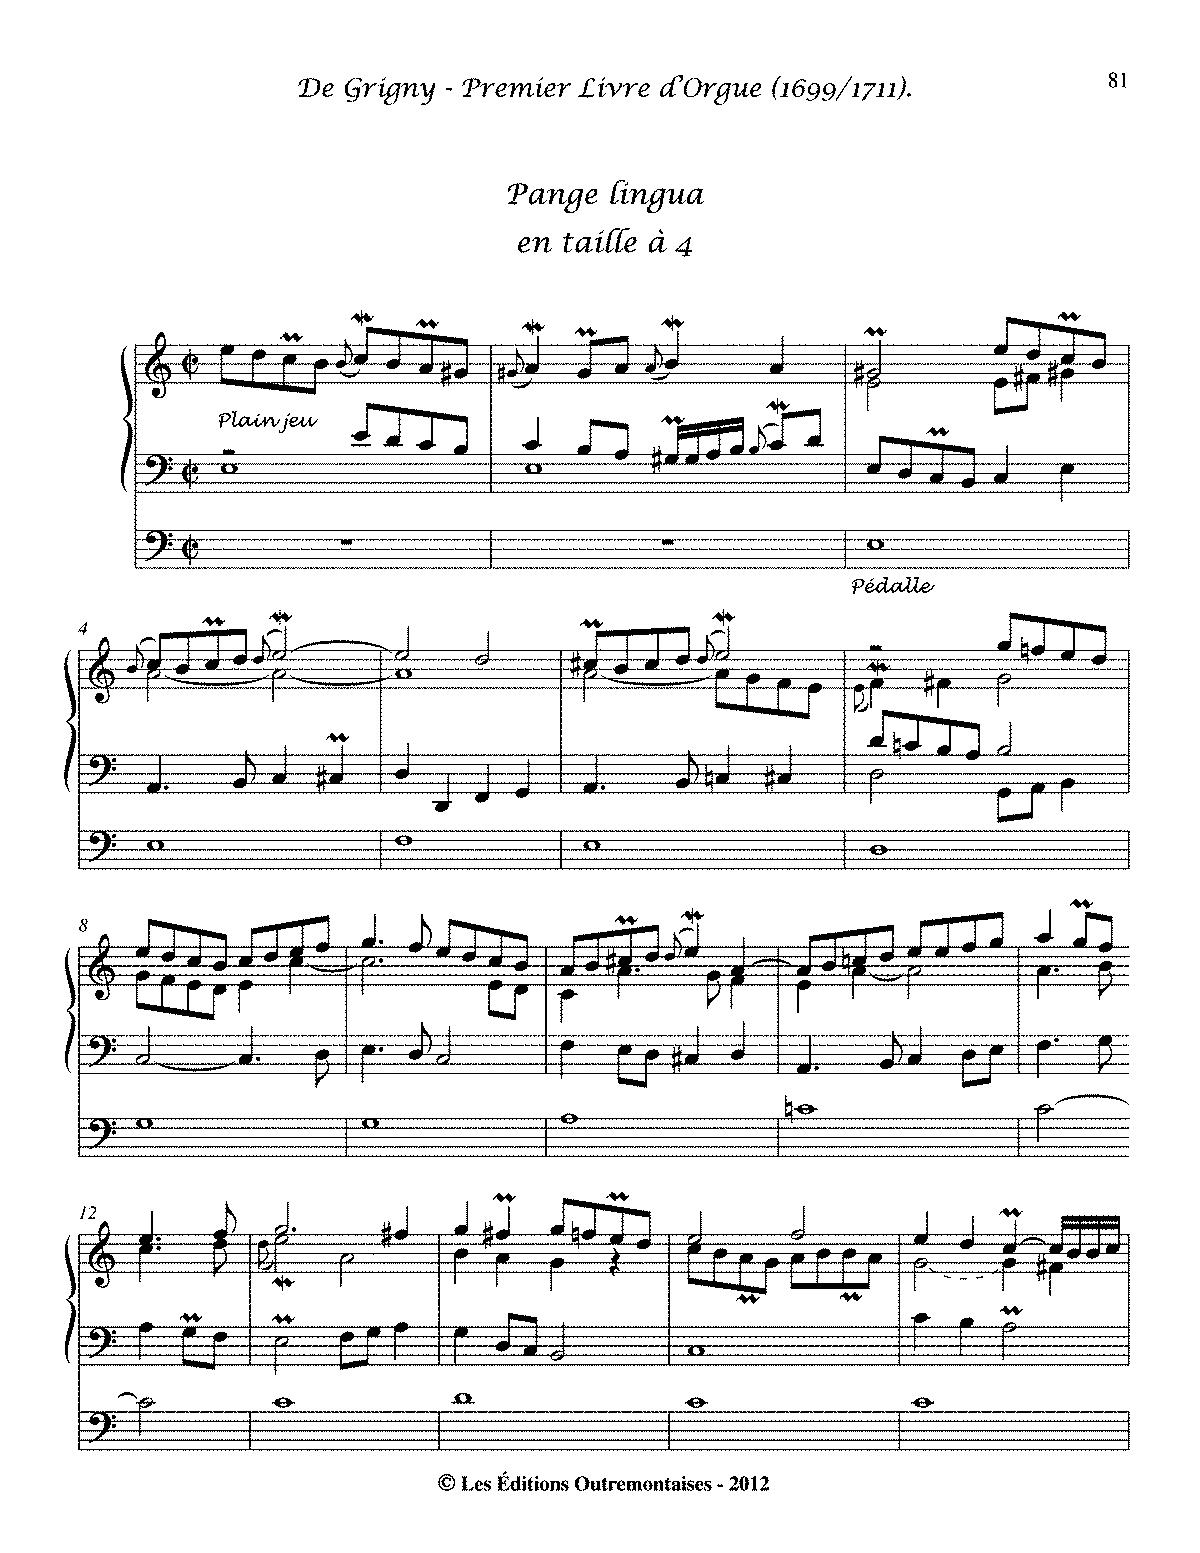 Pange lingua (Grigny, Nicolas de) - IMSLP/Petrucci Music Library ...